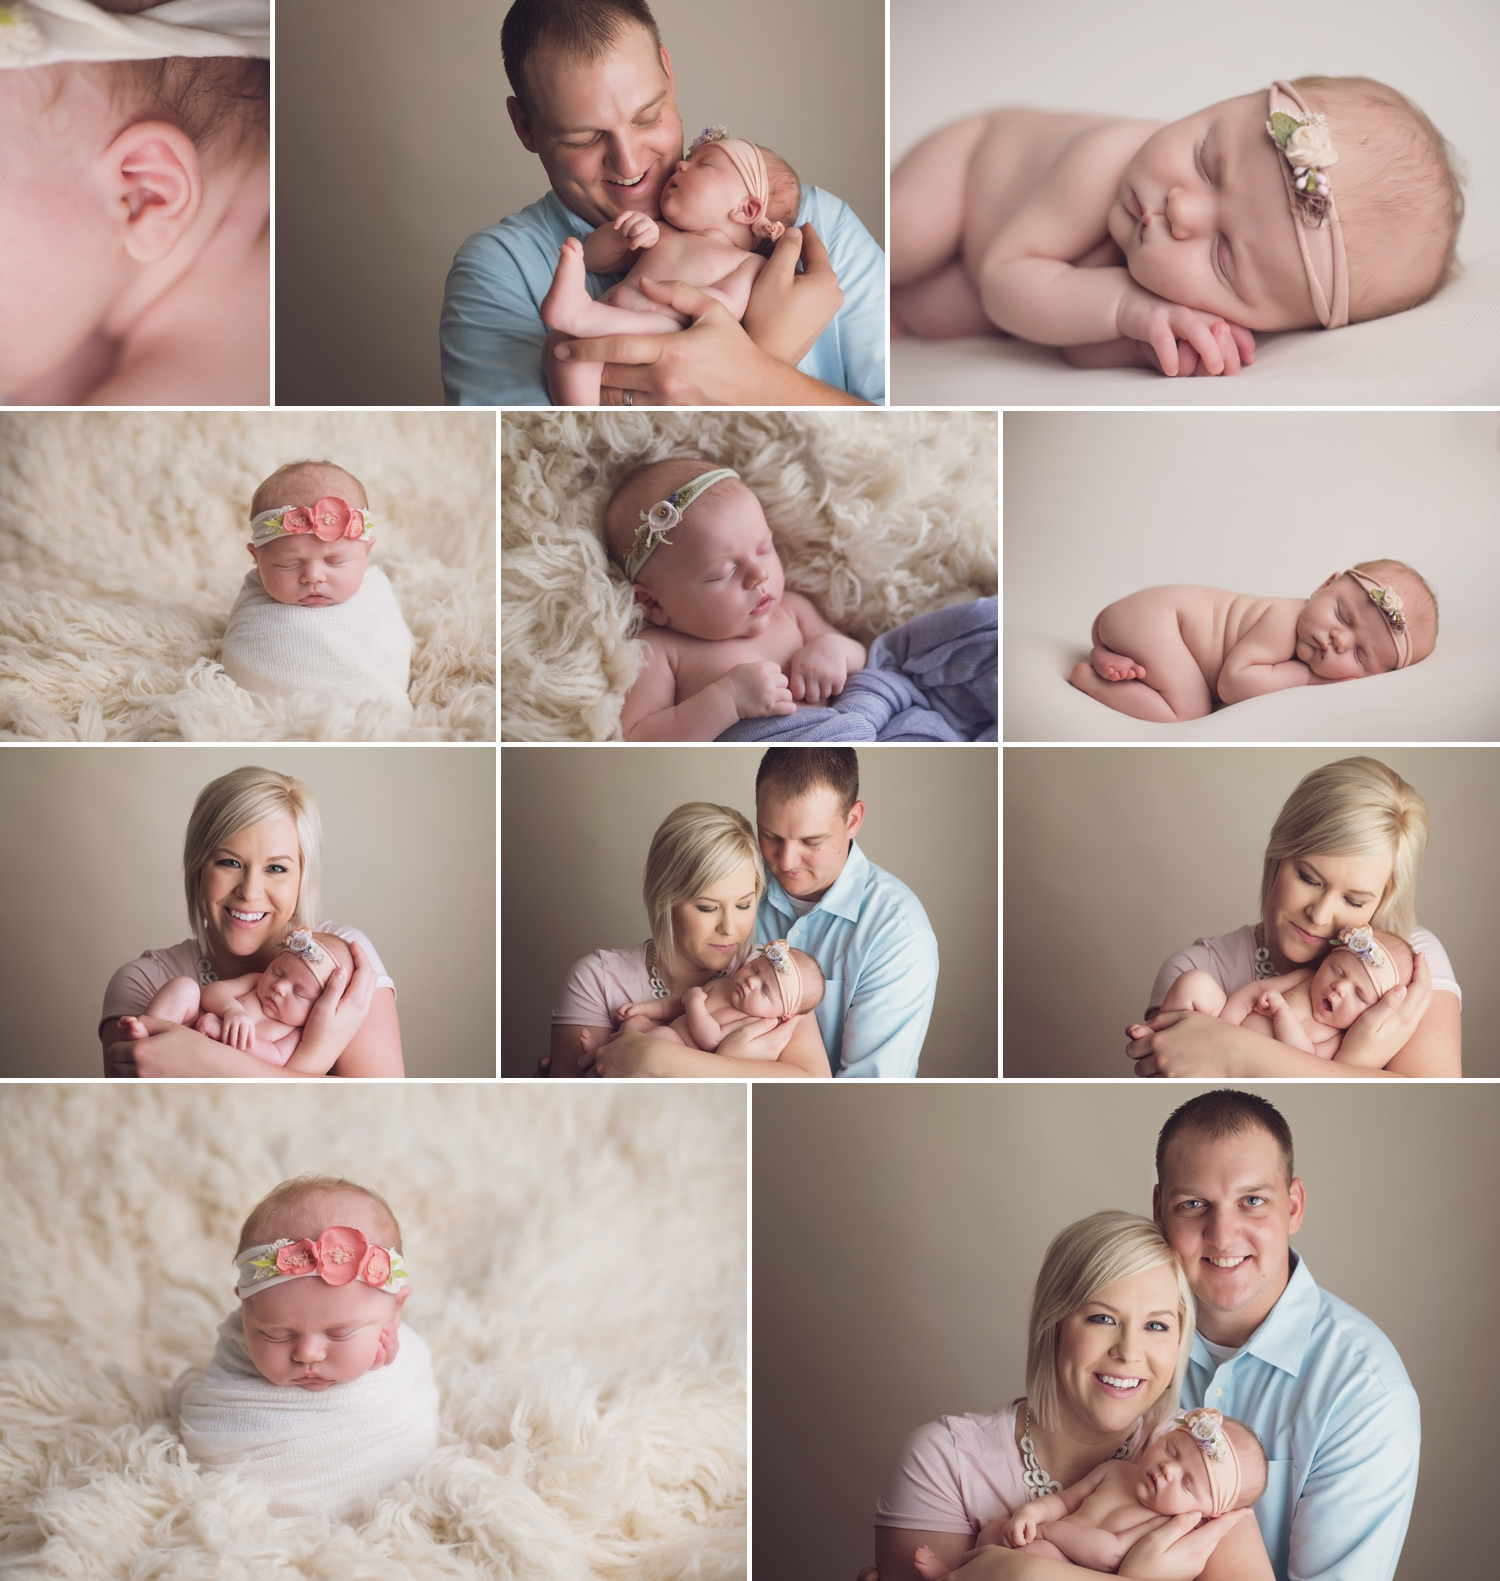 southwest-kansas-newborn-photography 1.jpg